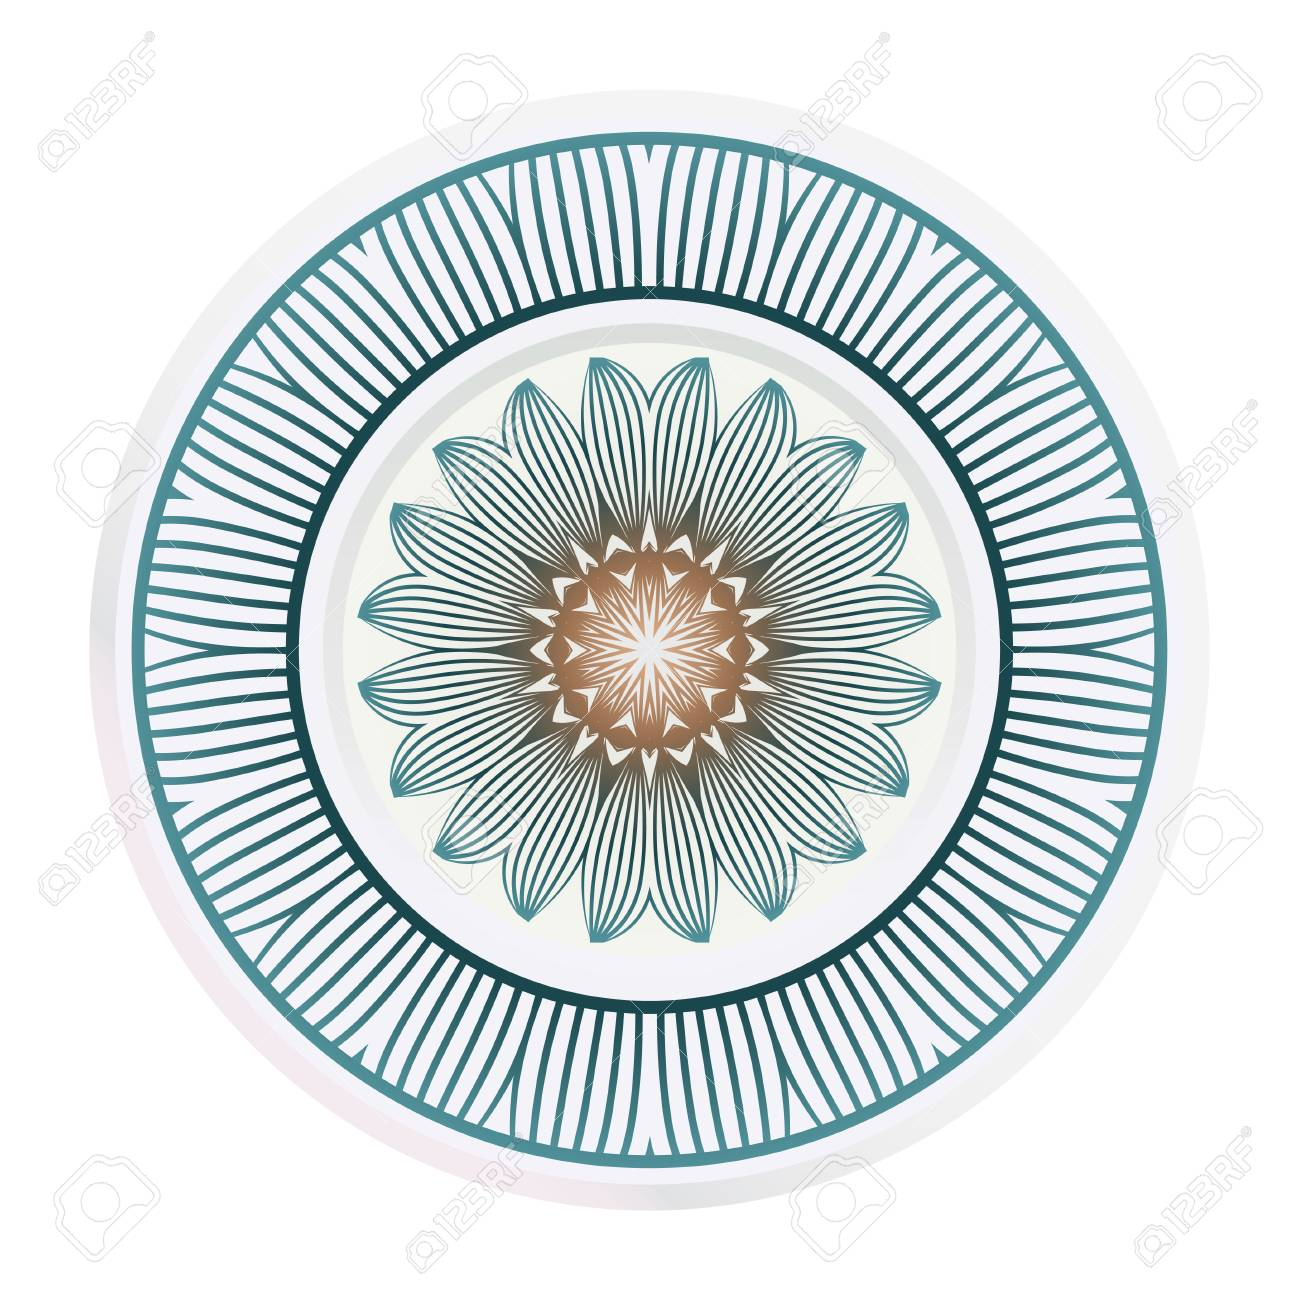 matching decorative plates. Decorative mandala ornament. Vector..